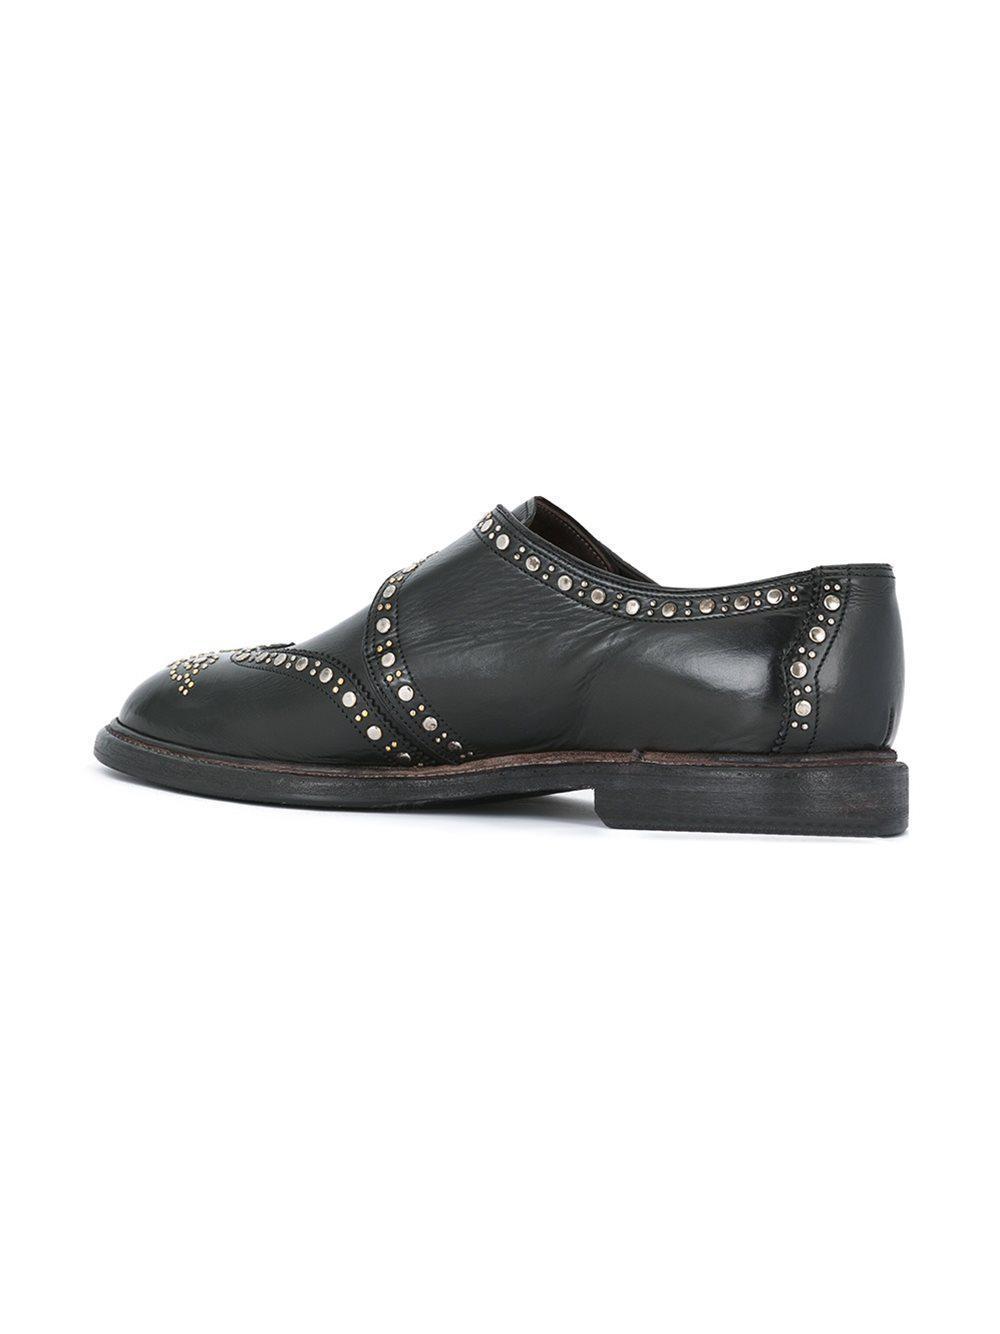 Dolce & Gabbana Cloutés Chaussures Moine - Noir xT4XpaXDc7